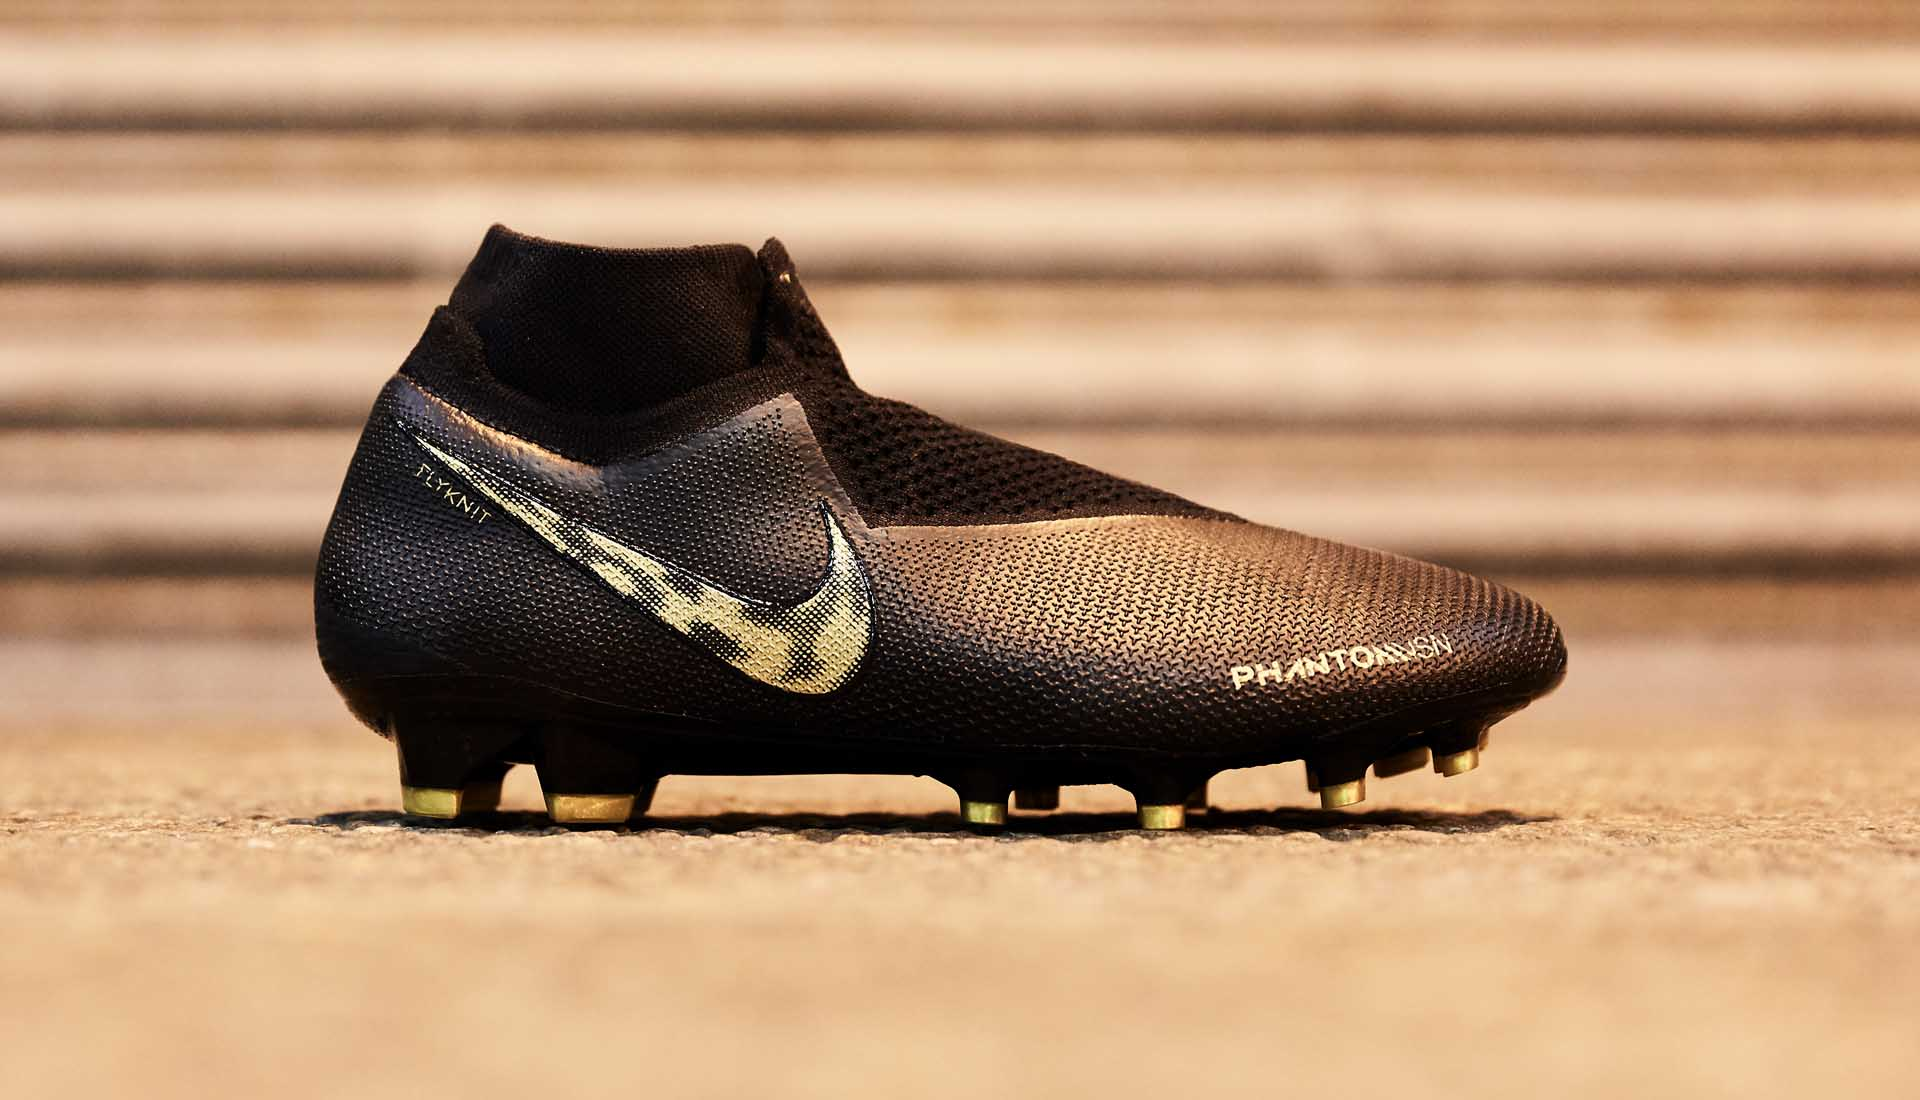 nike soccer boots black